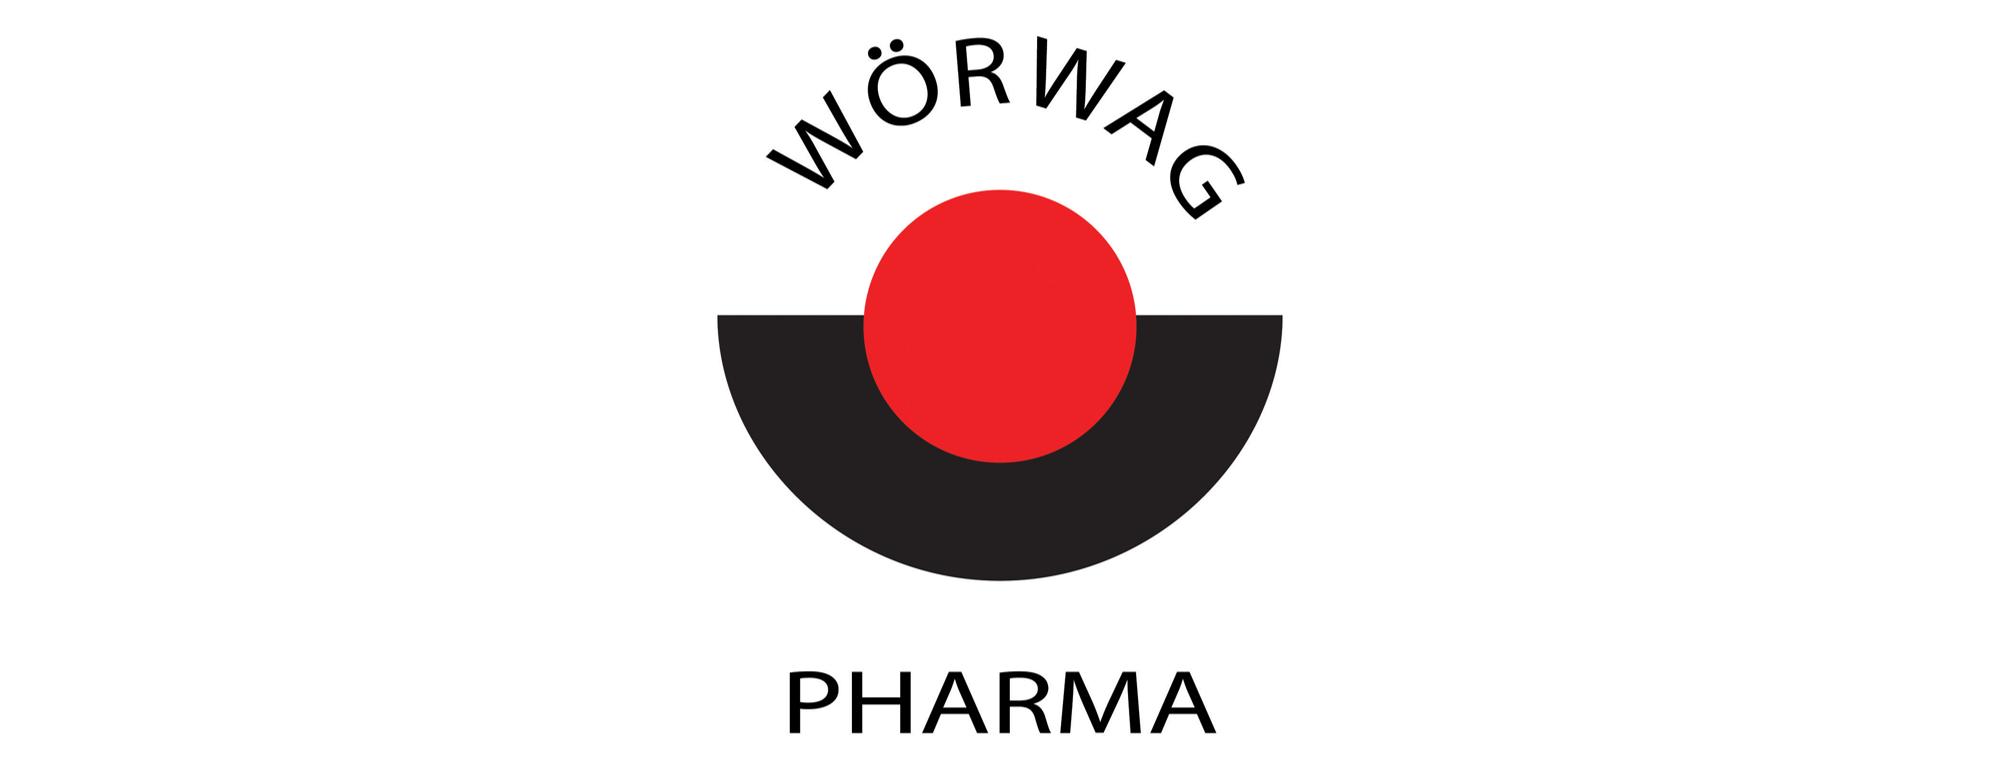 klient-wooacademy-worwag-pharma-logo